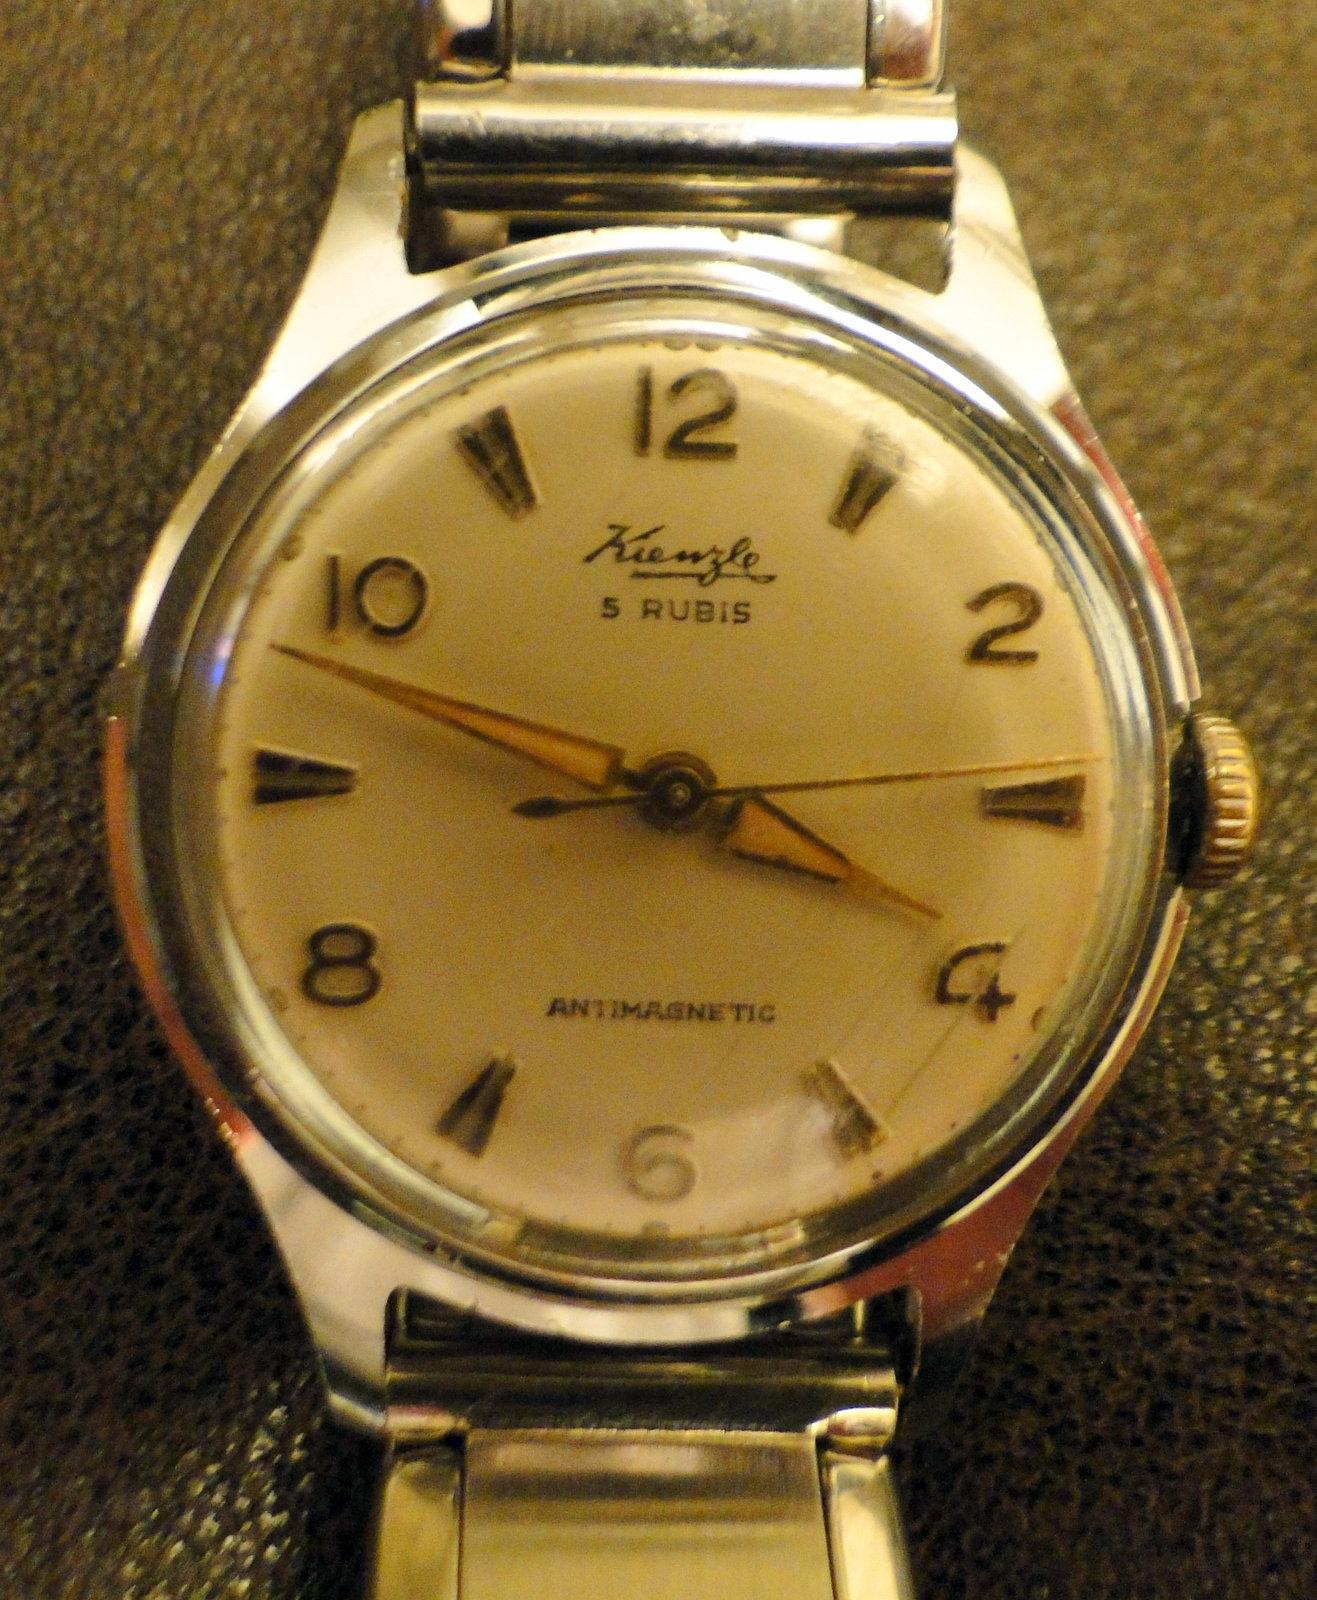 Kienzle Uhr